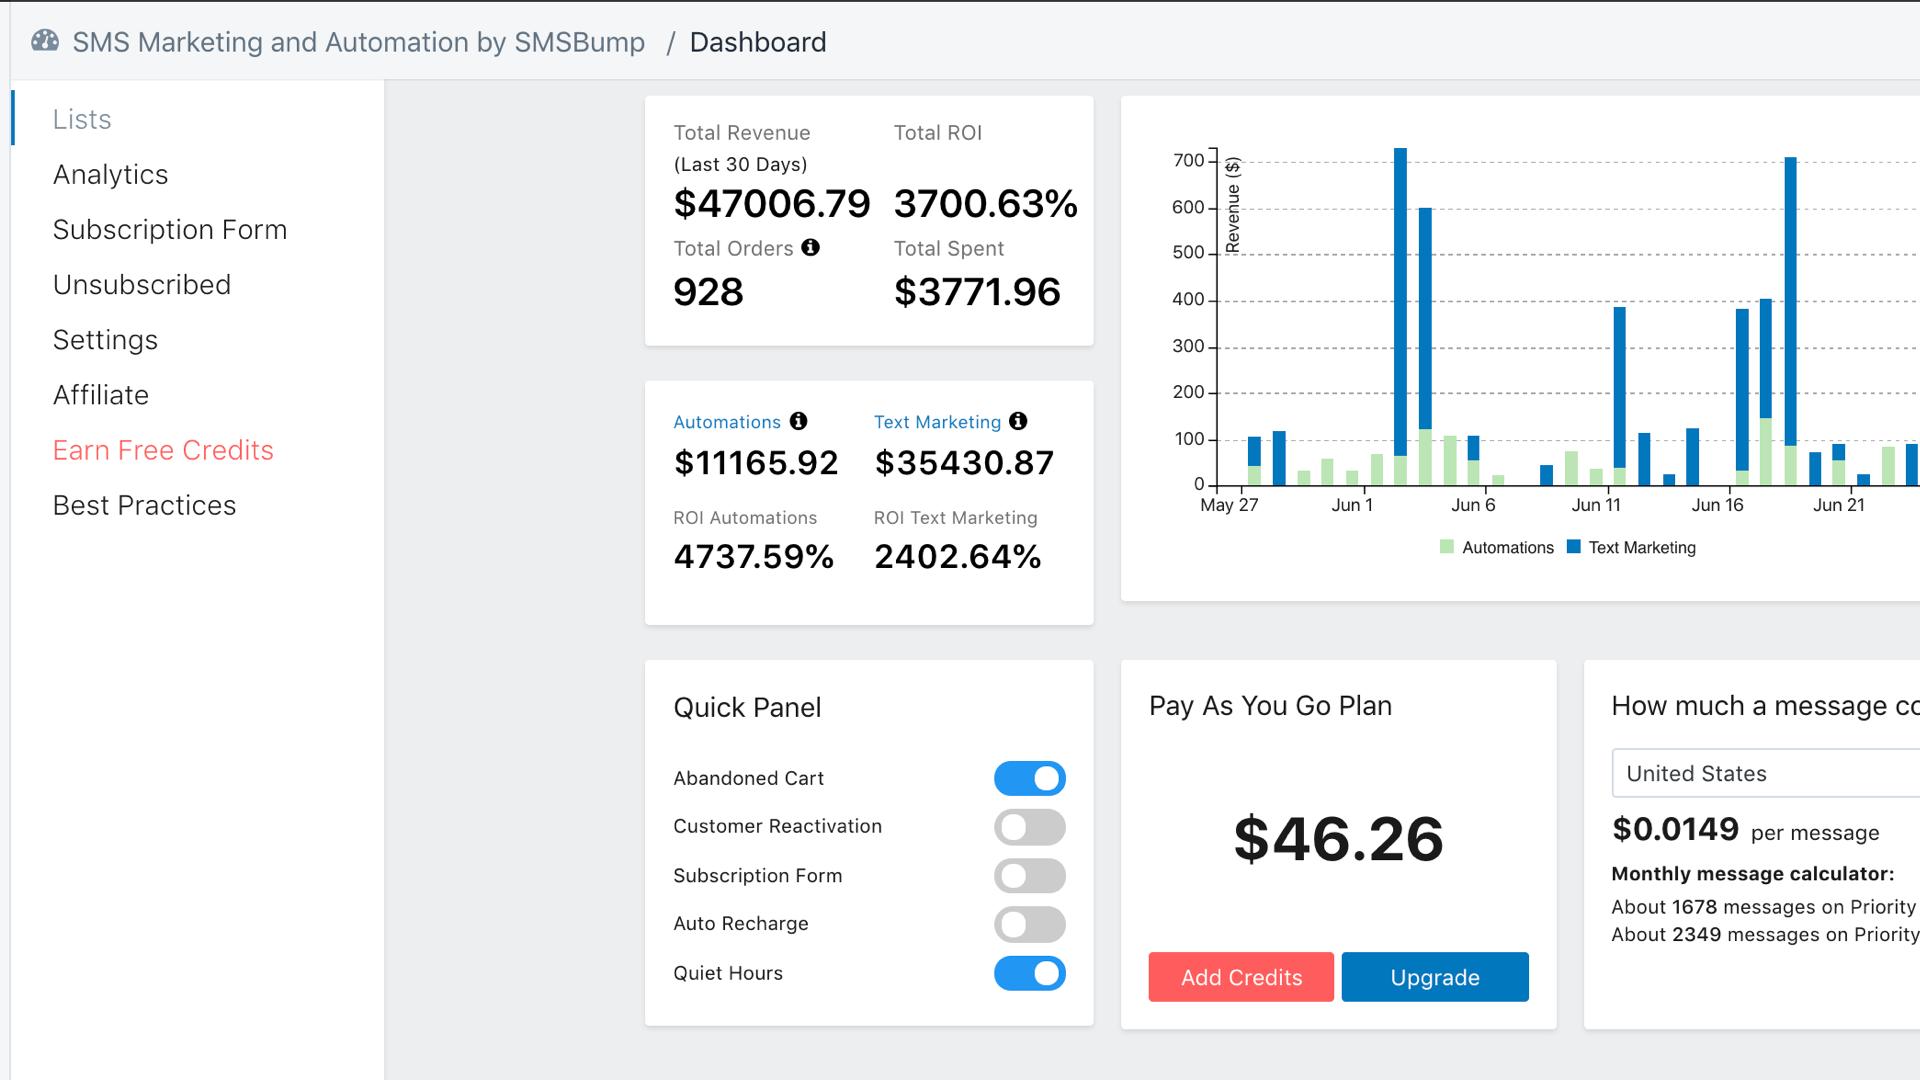 Screenshot showing a dashboard for SMSbump